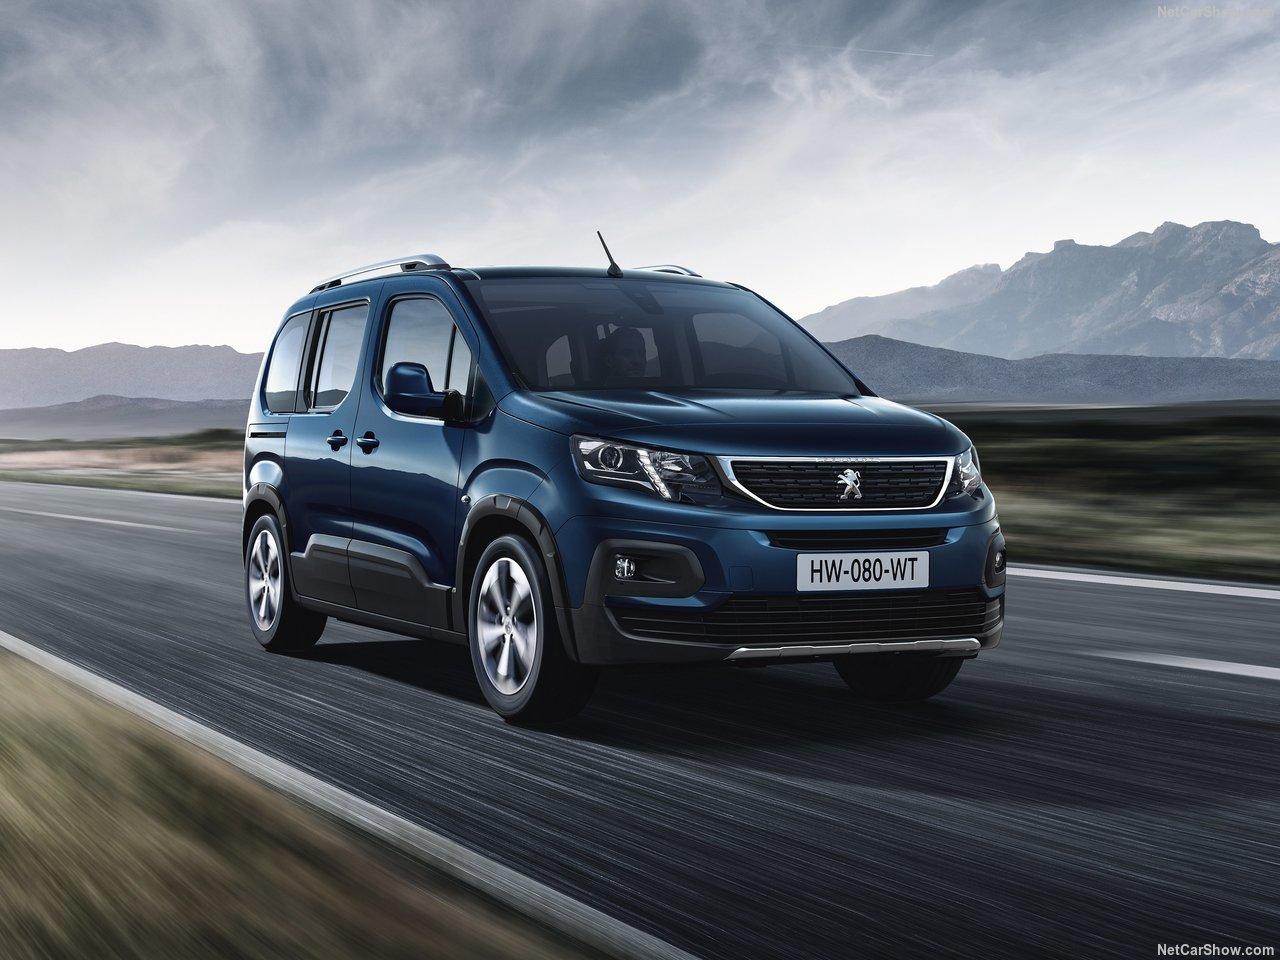 Peugeot Rifter 2019: цены, комплектации, фото